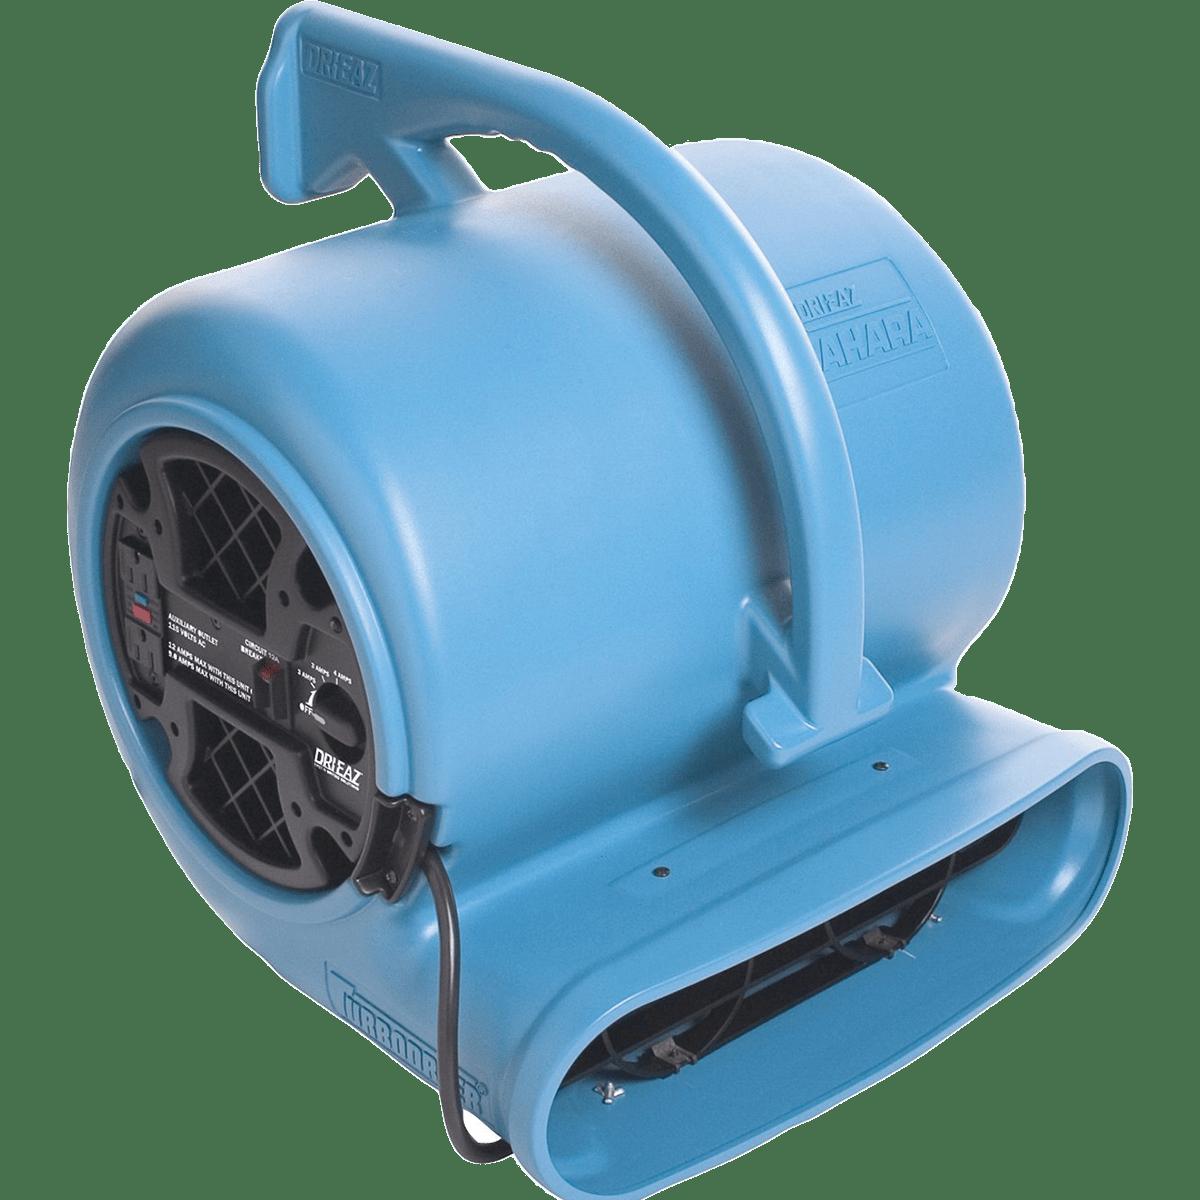 Dri-Eaz Sahara Pro X3 Air Mover - Image 1